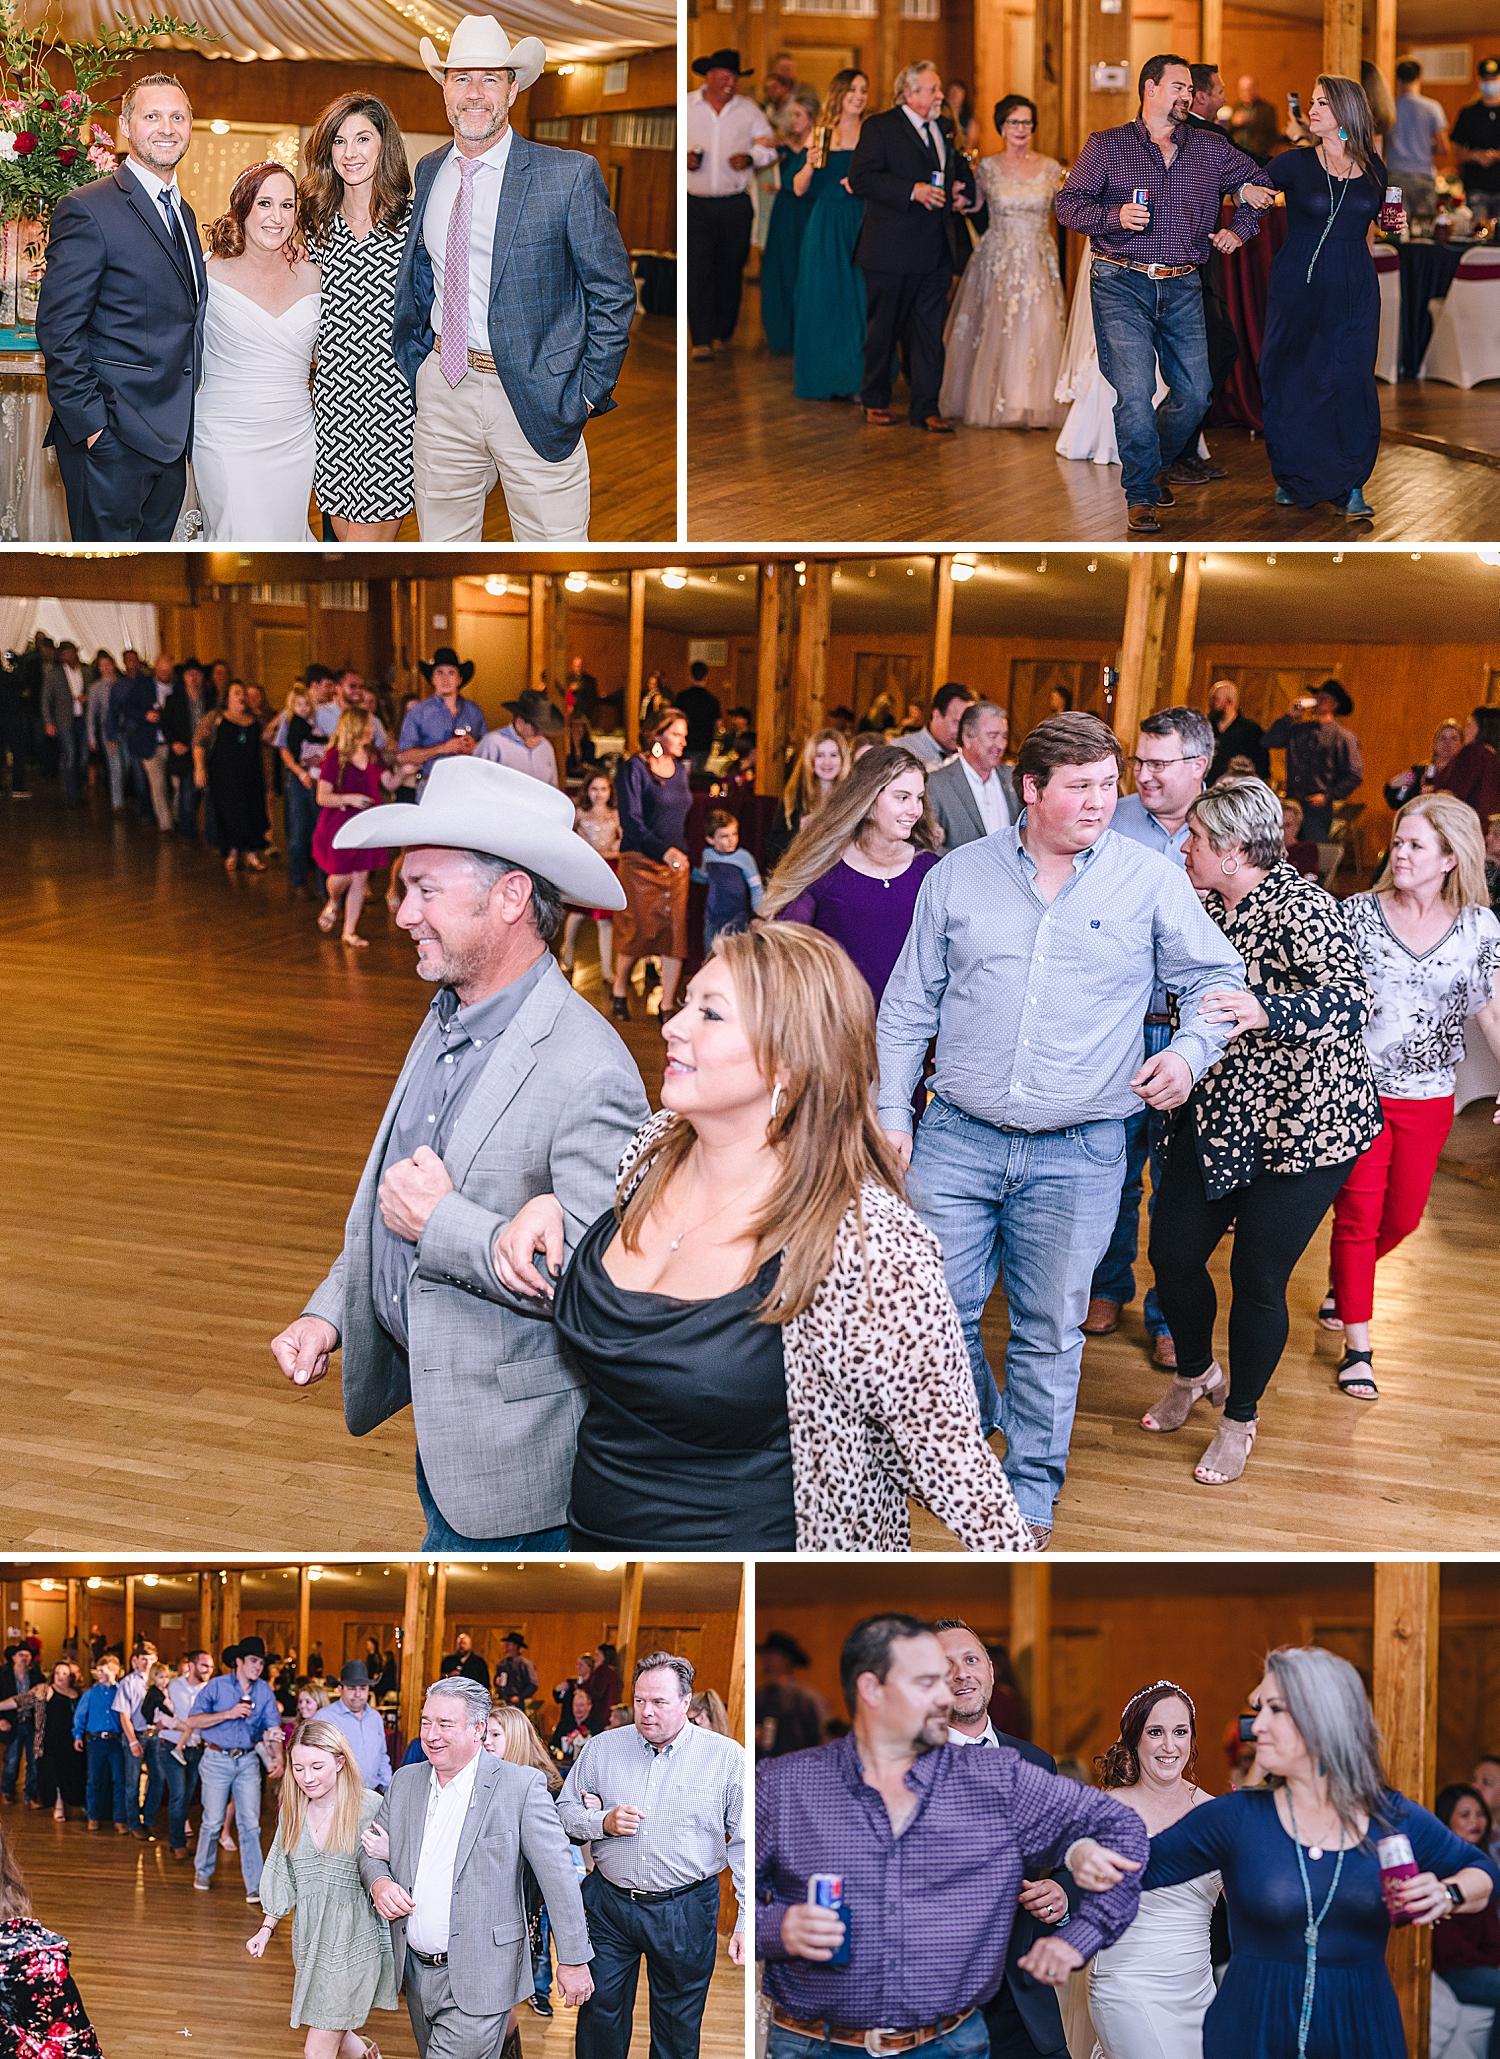 Jewel-Tone-Texas-Wedding-Valerie-Jason-Carly-Barton-Photography_0089.jpg